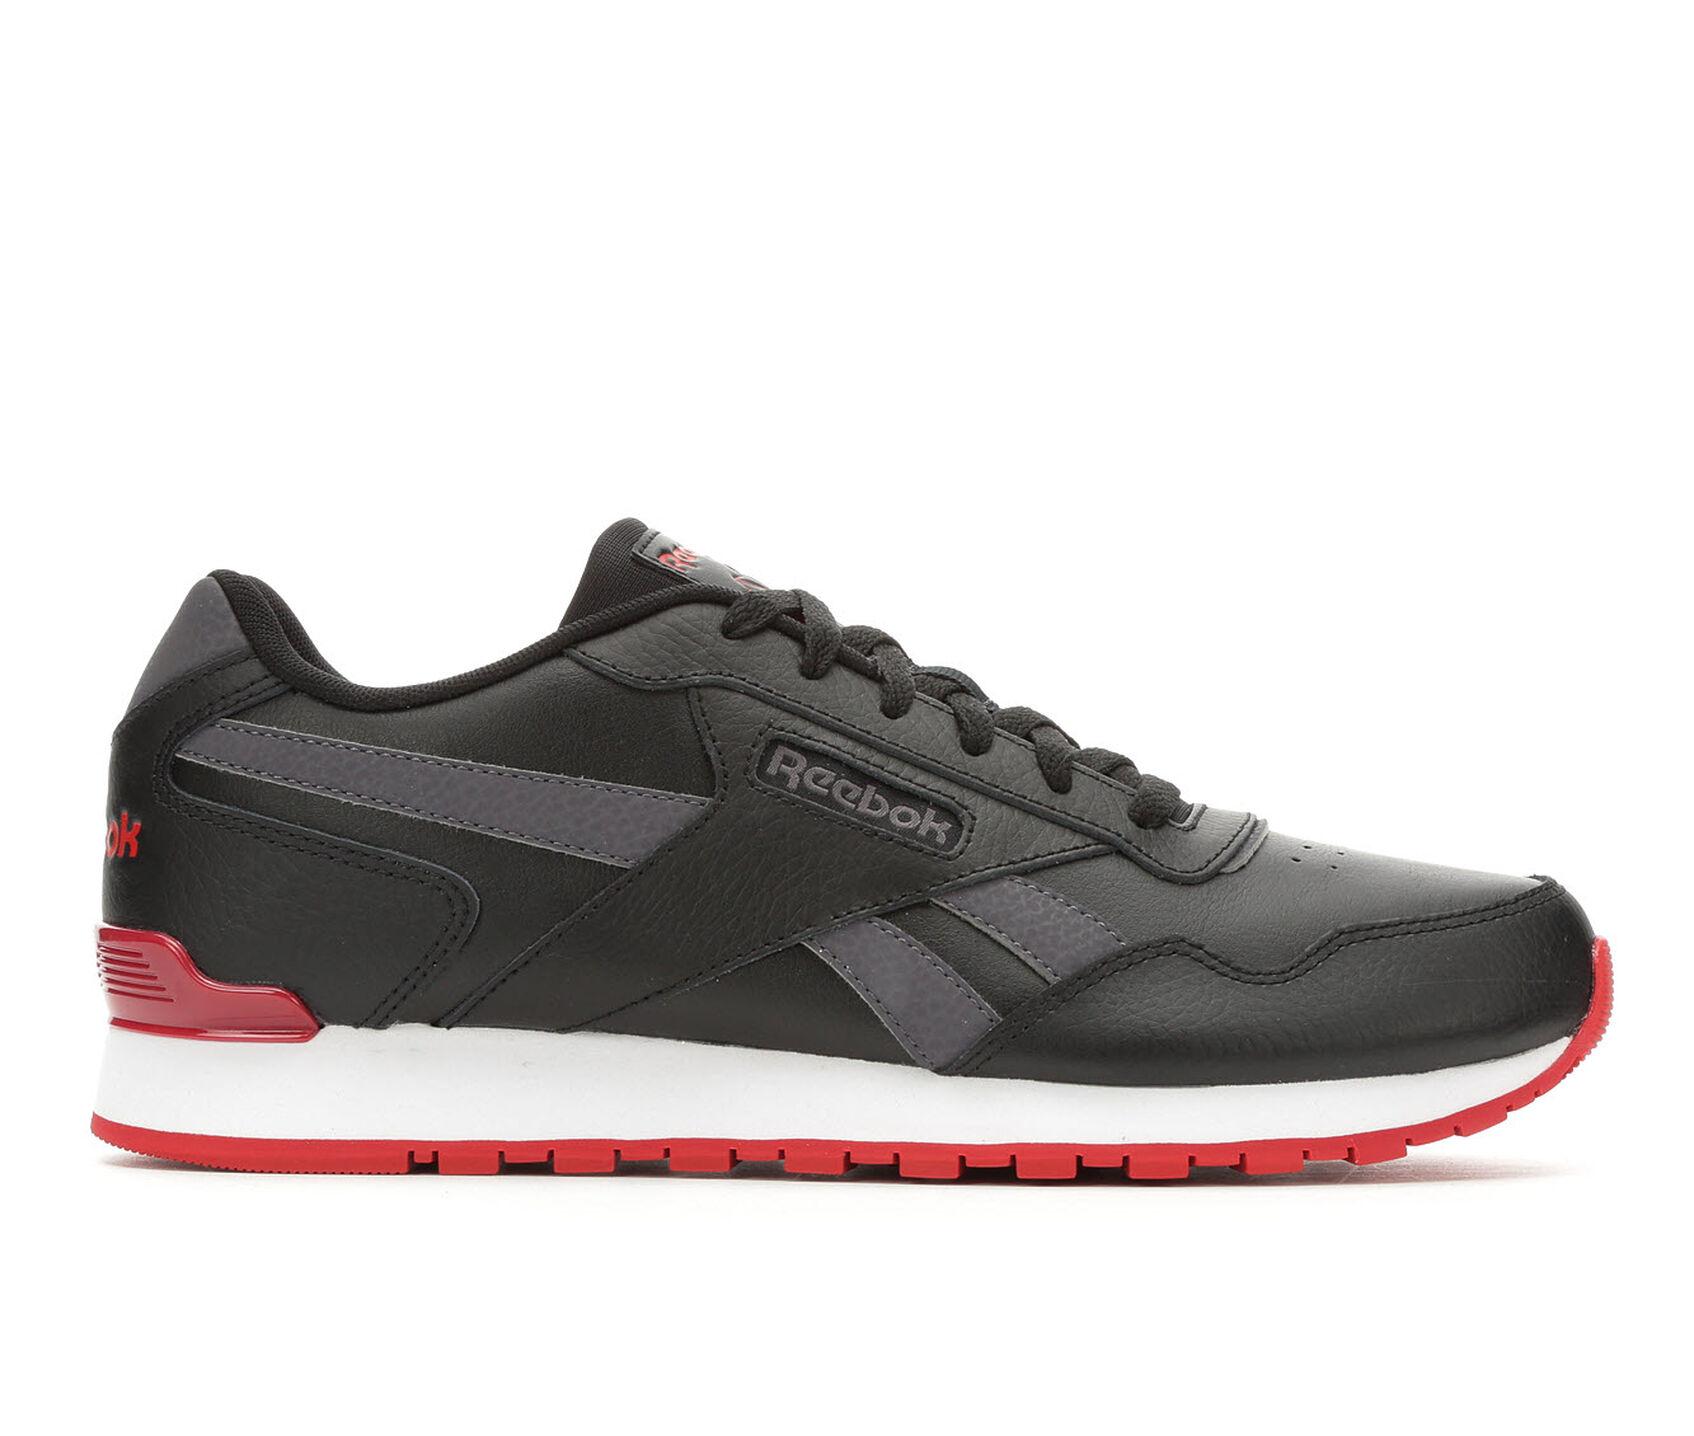 4d9ff5538b12e ... Reebok Harman Run Clip Retro Sneakers. Previous